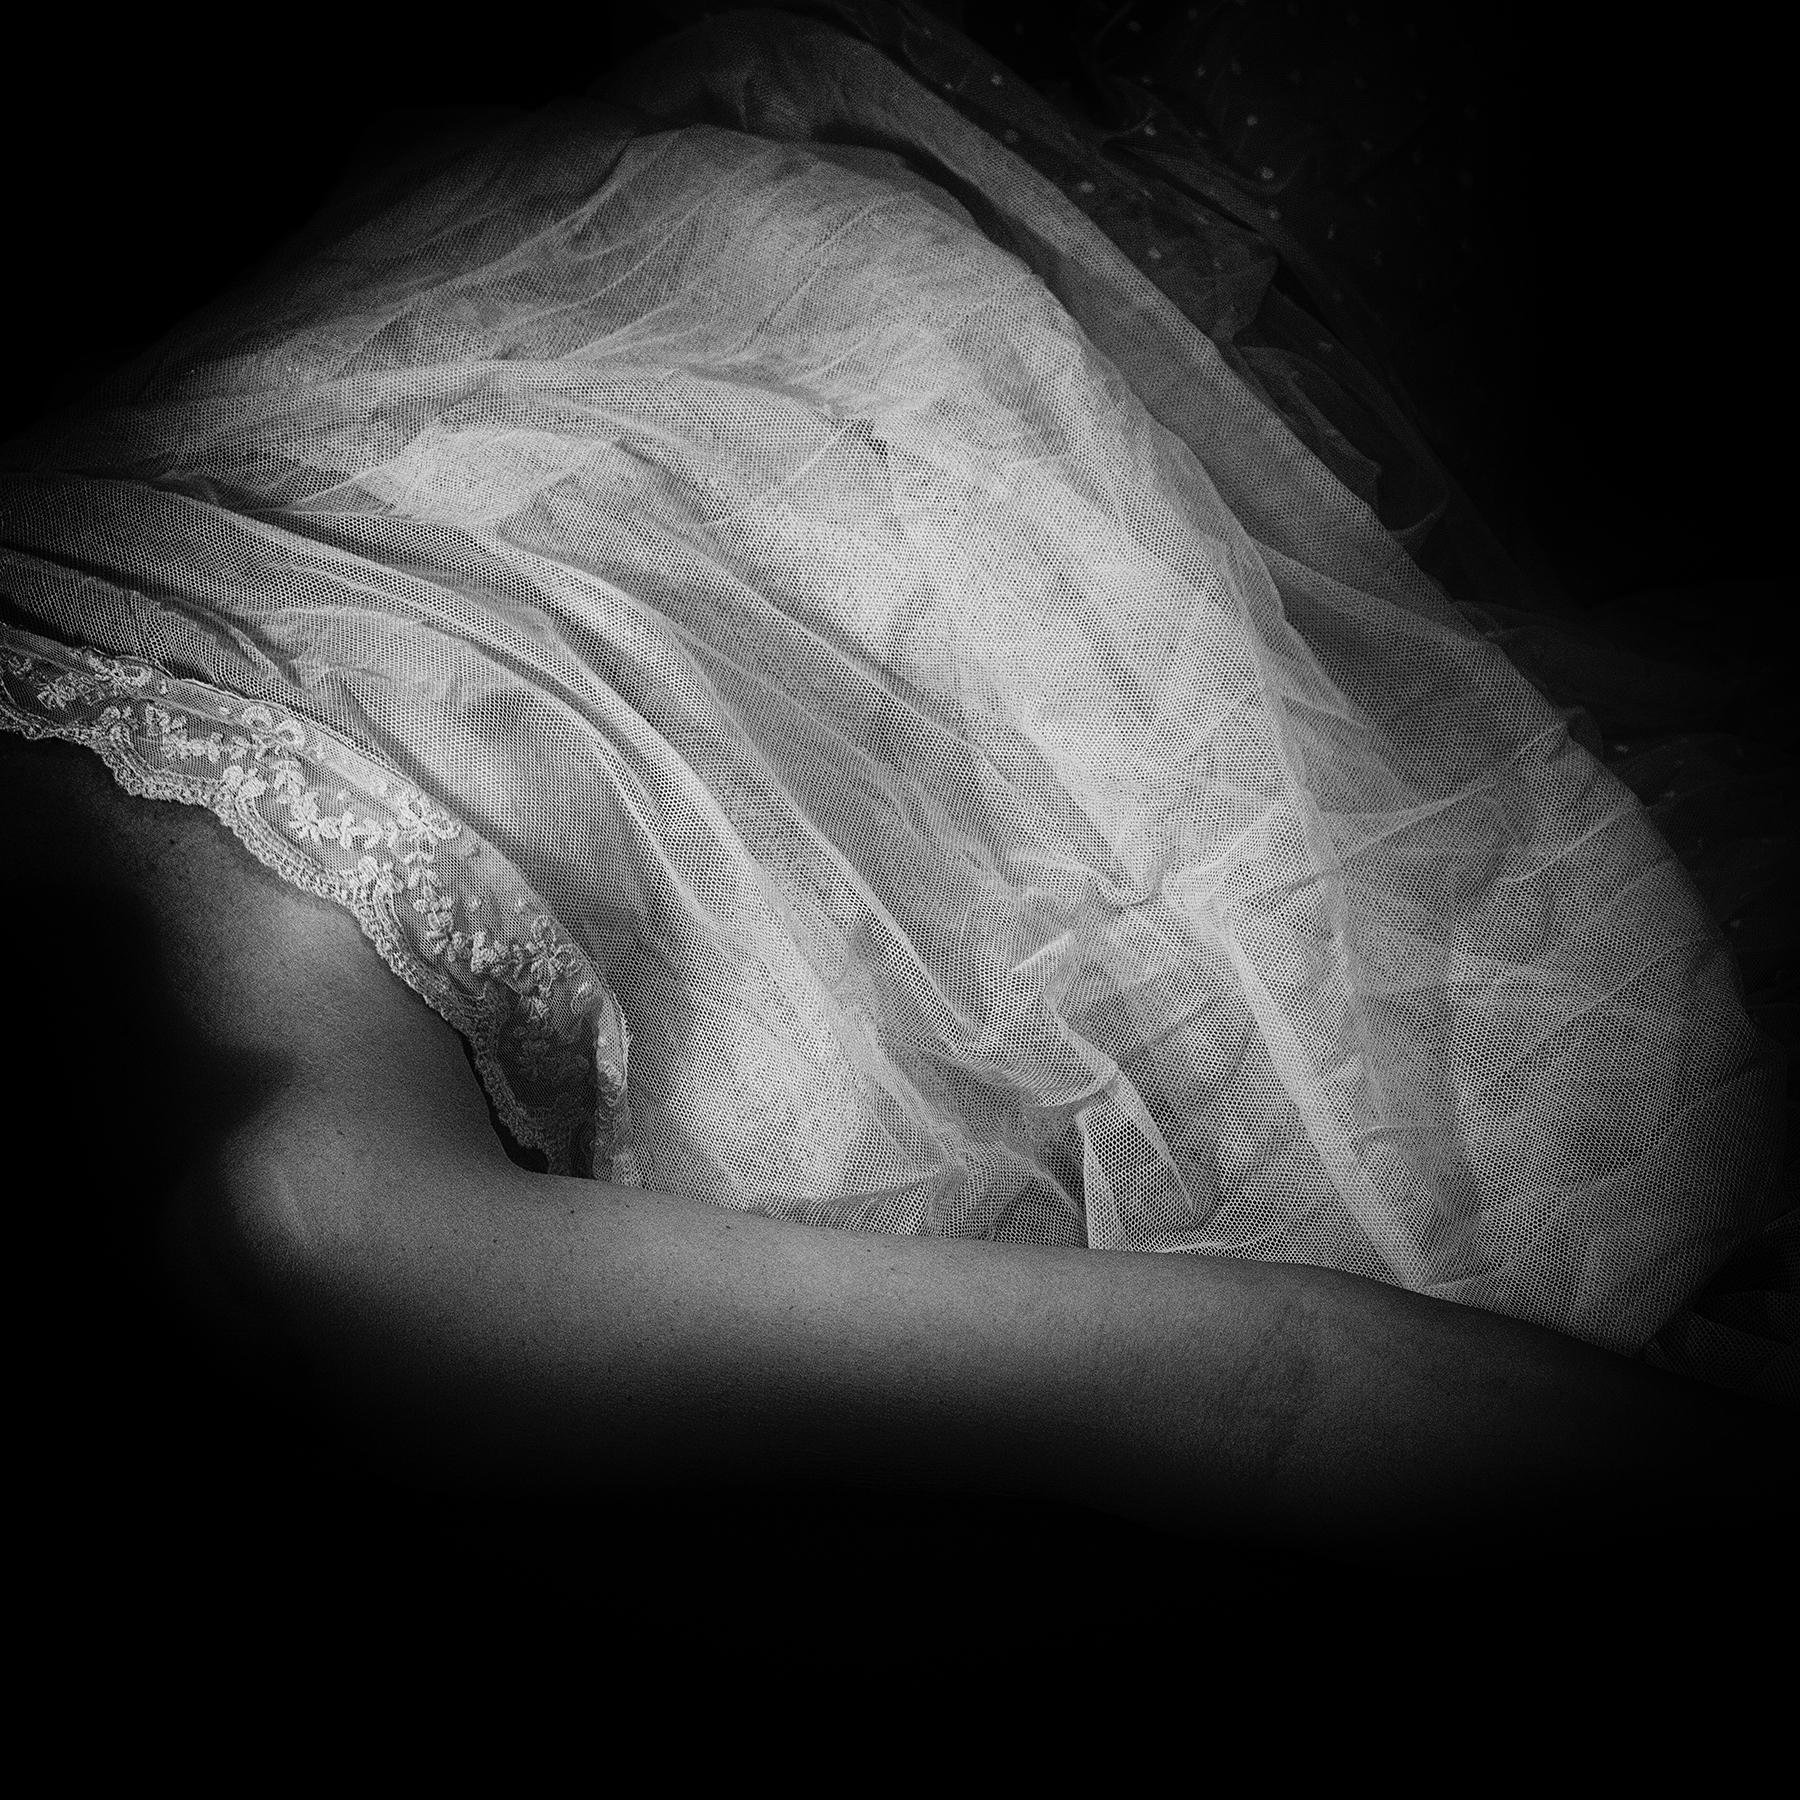 dreaming light - body, blackandwhitephotography - anagilbert | ello